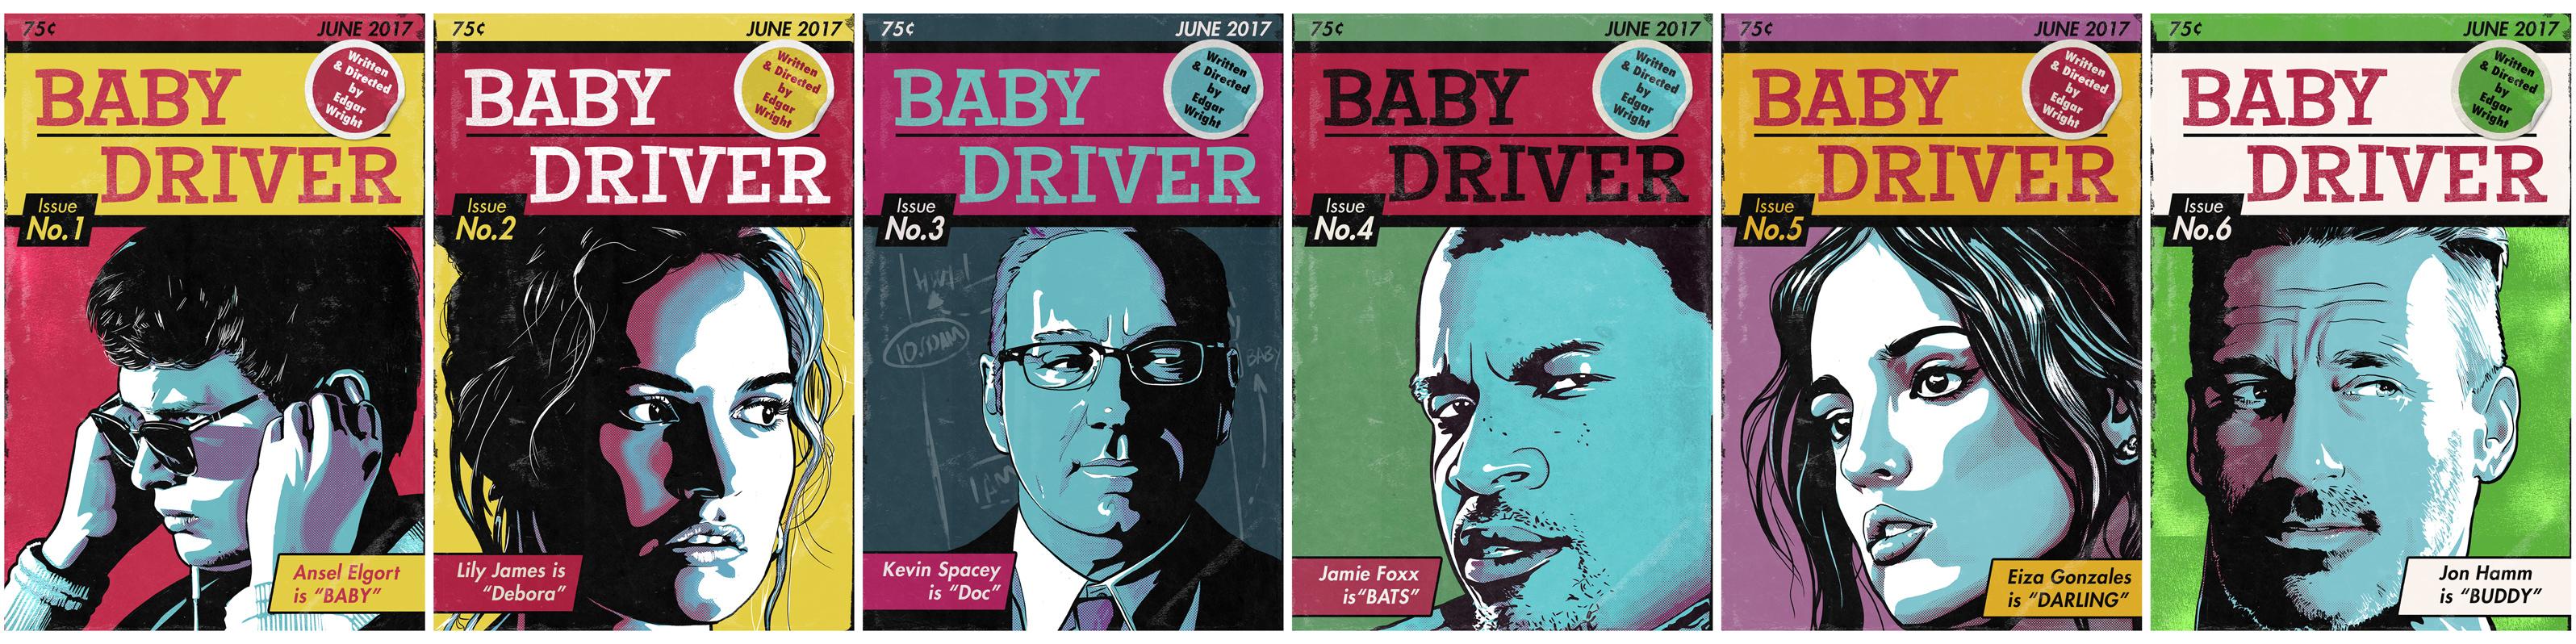 Baby driver movie poster artist